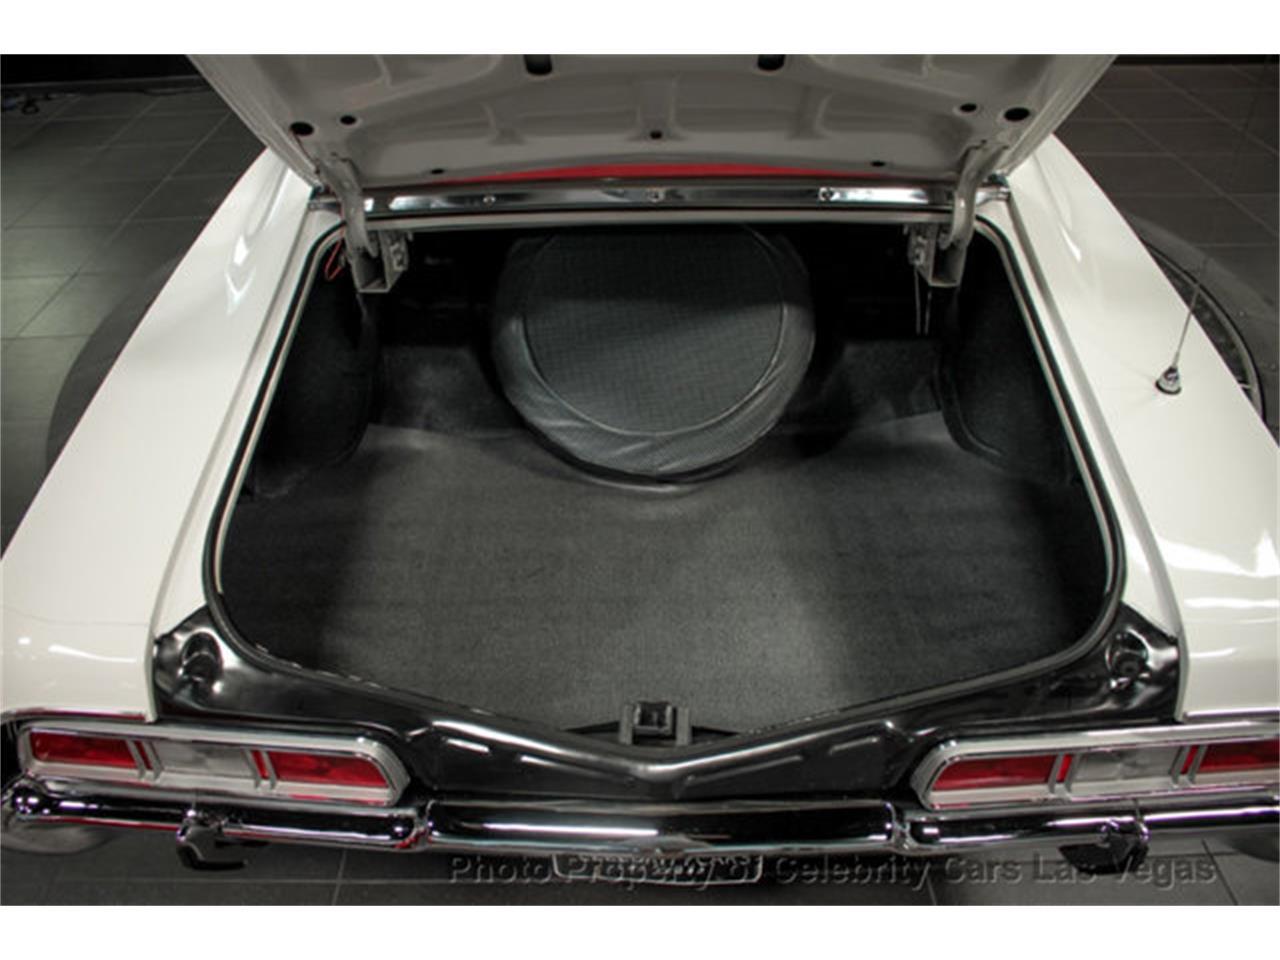 1967 Chevrolet Impala SS (CC-1174256) for sale in Las Vegas, Nevada